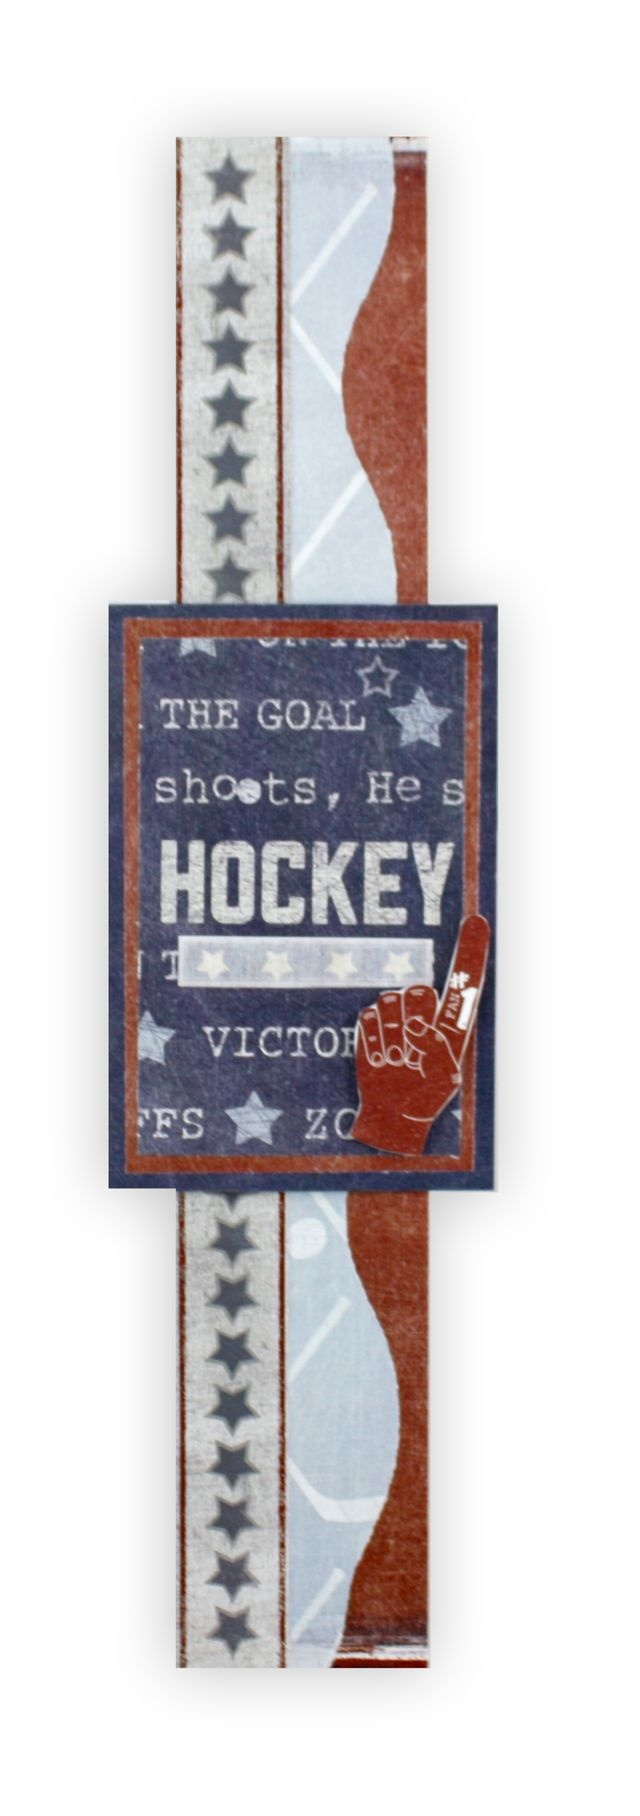 How to scrapbook memories - Hockey Additions Scrapbooking Border Idea From Creative Memories